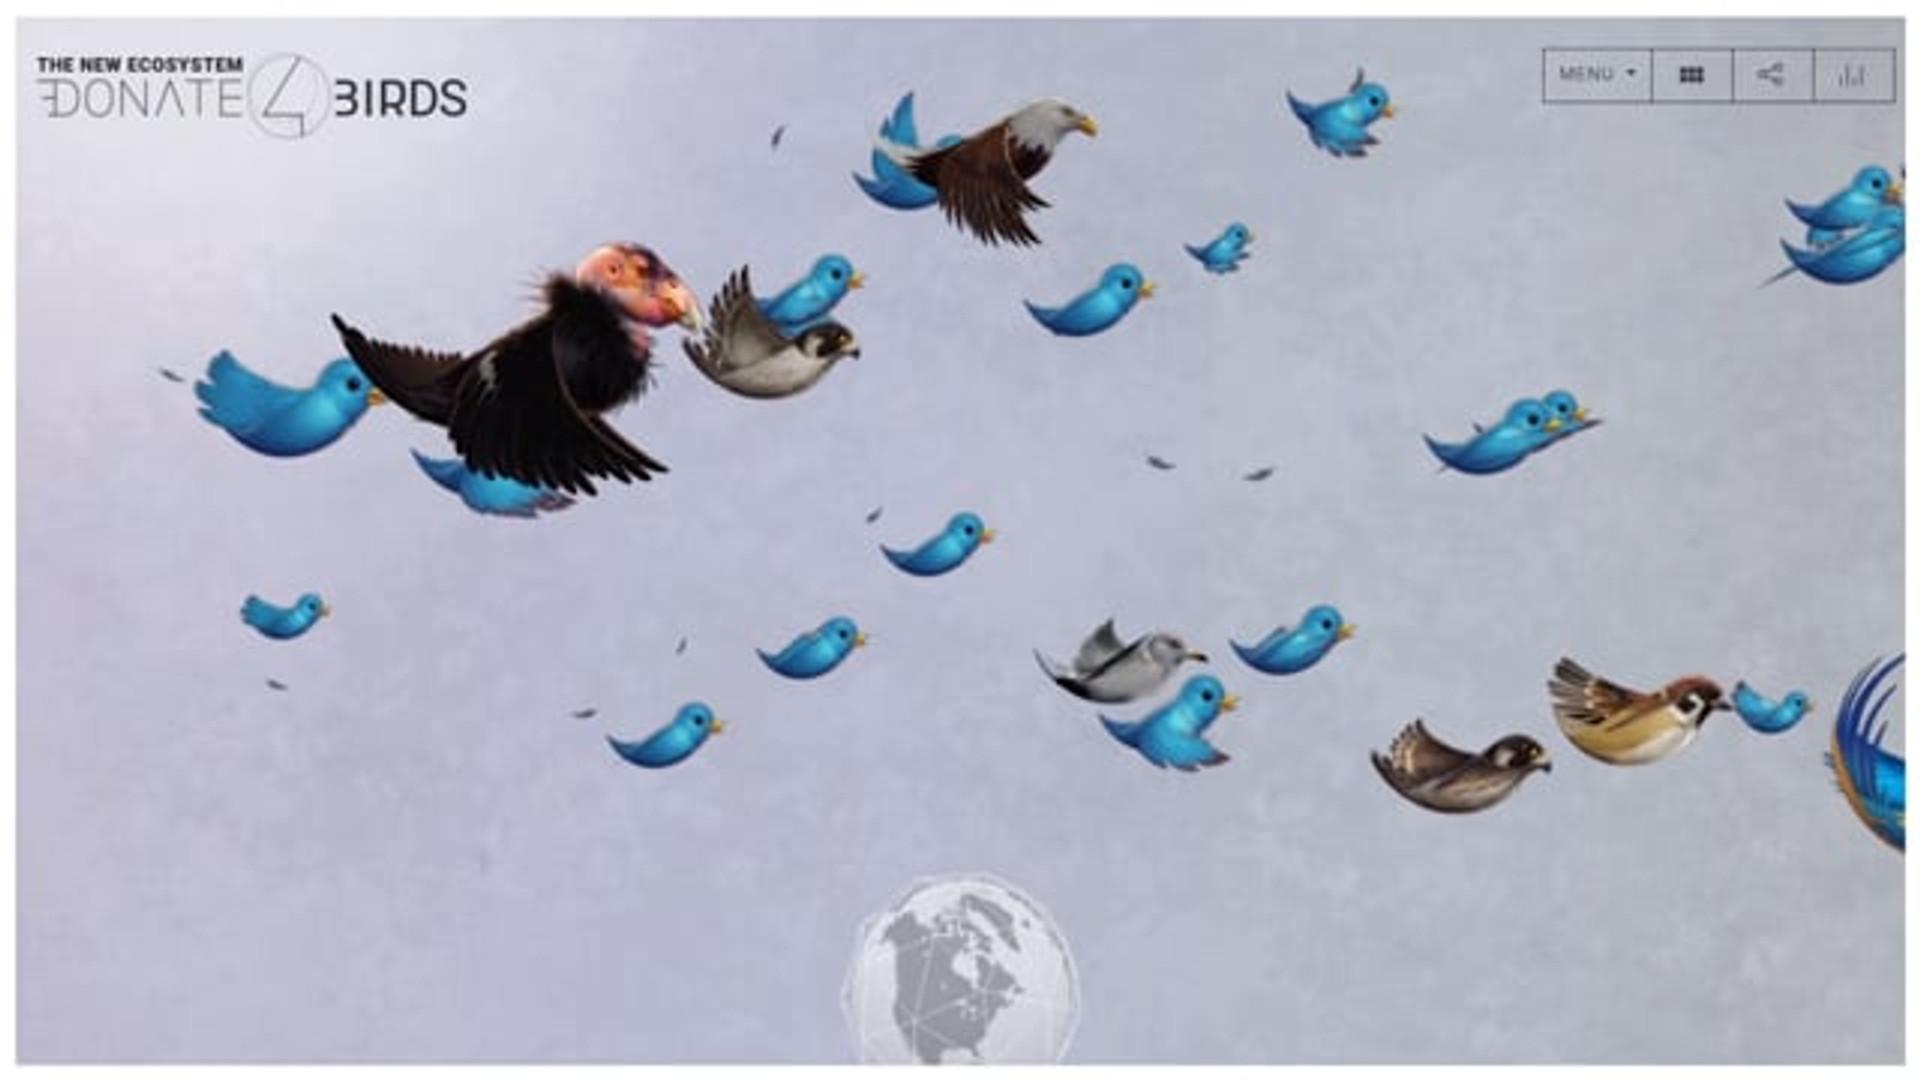 Conservation International / Donate 4 Birds